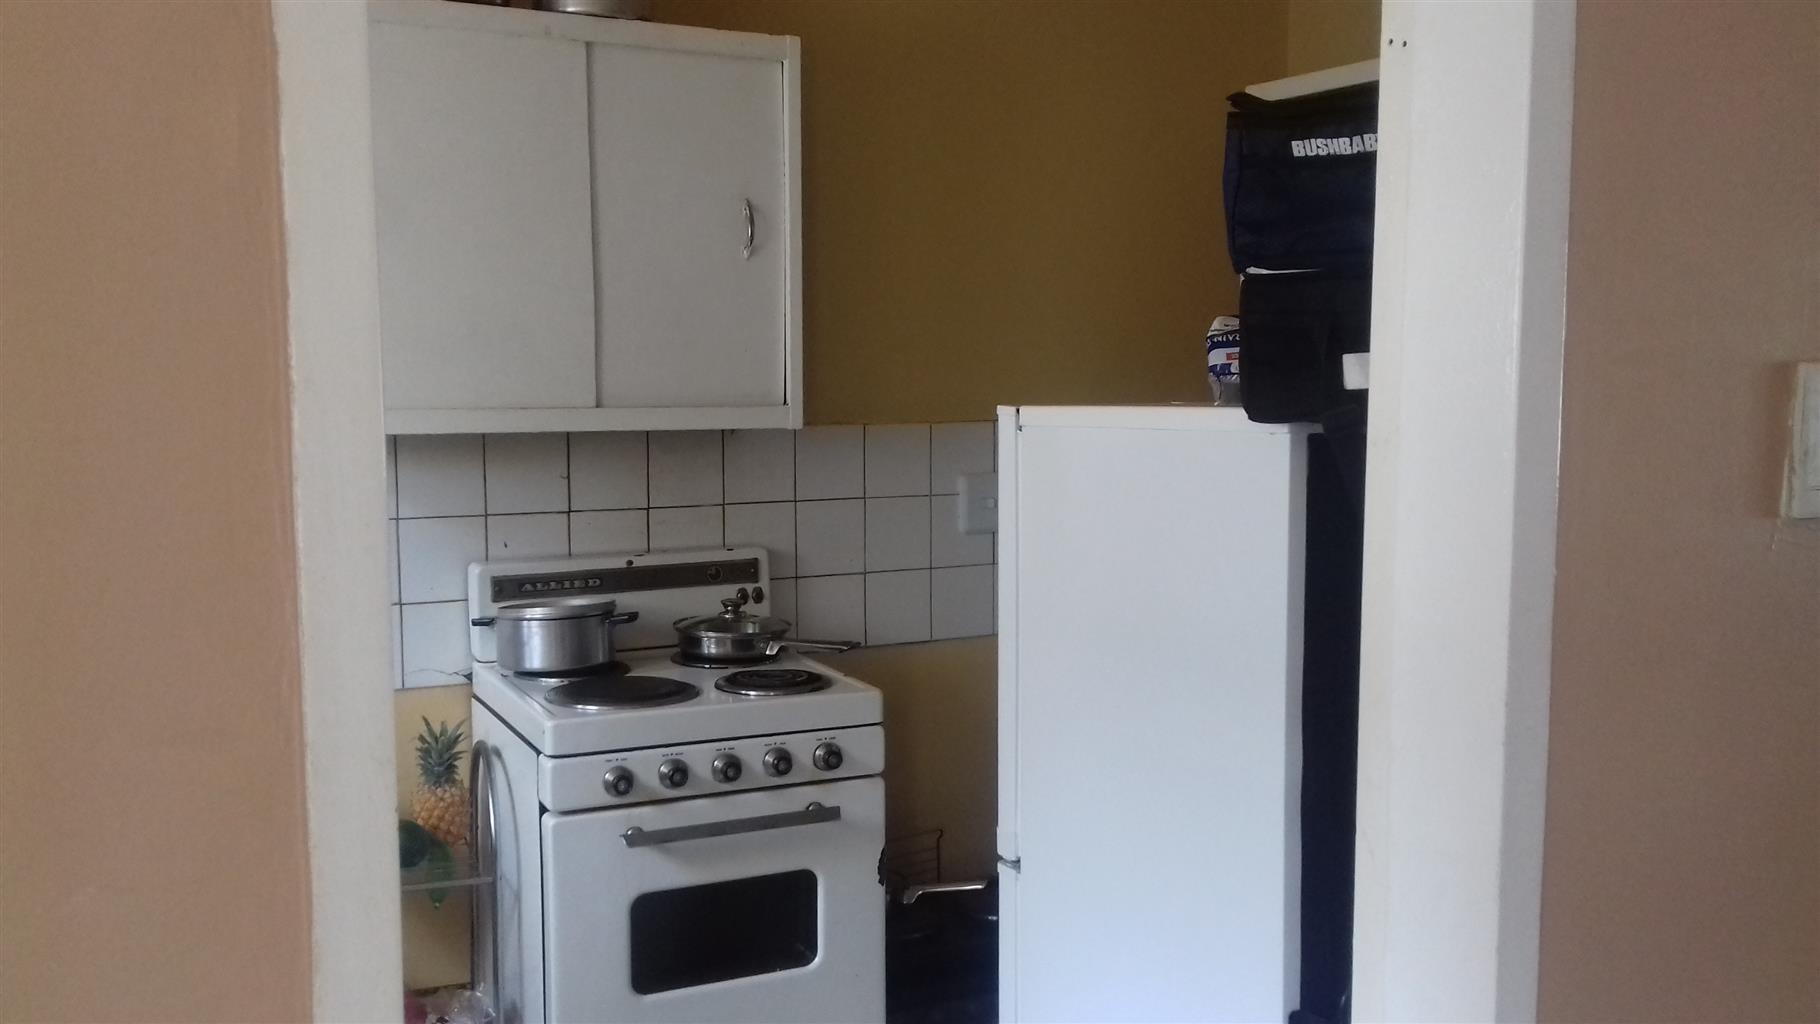 2.5 bed duplex flat in SunnSide East 6 000pm dep 3000 Quite & Clean